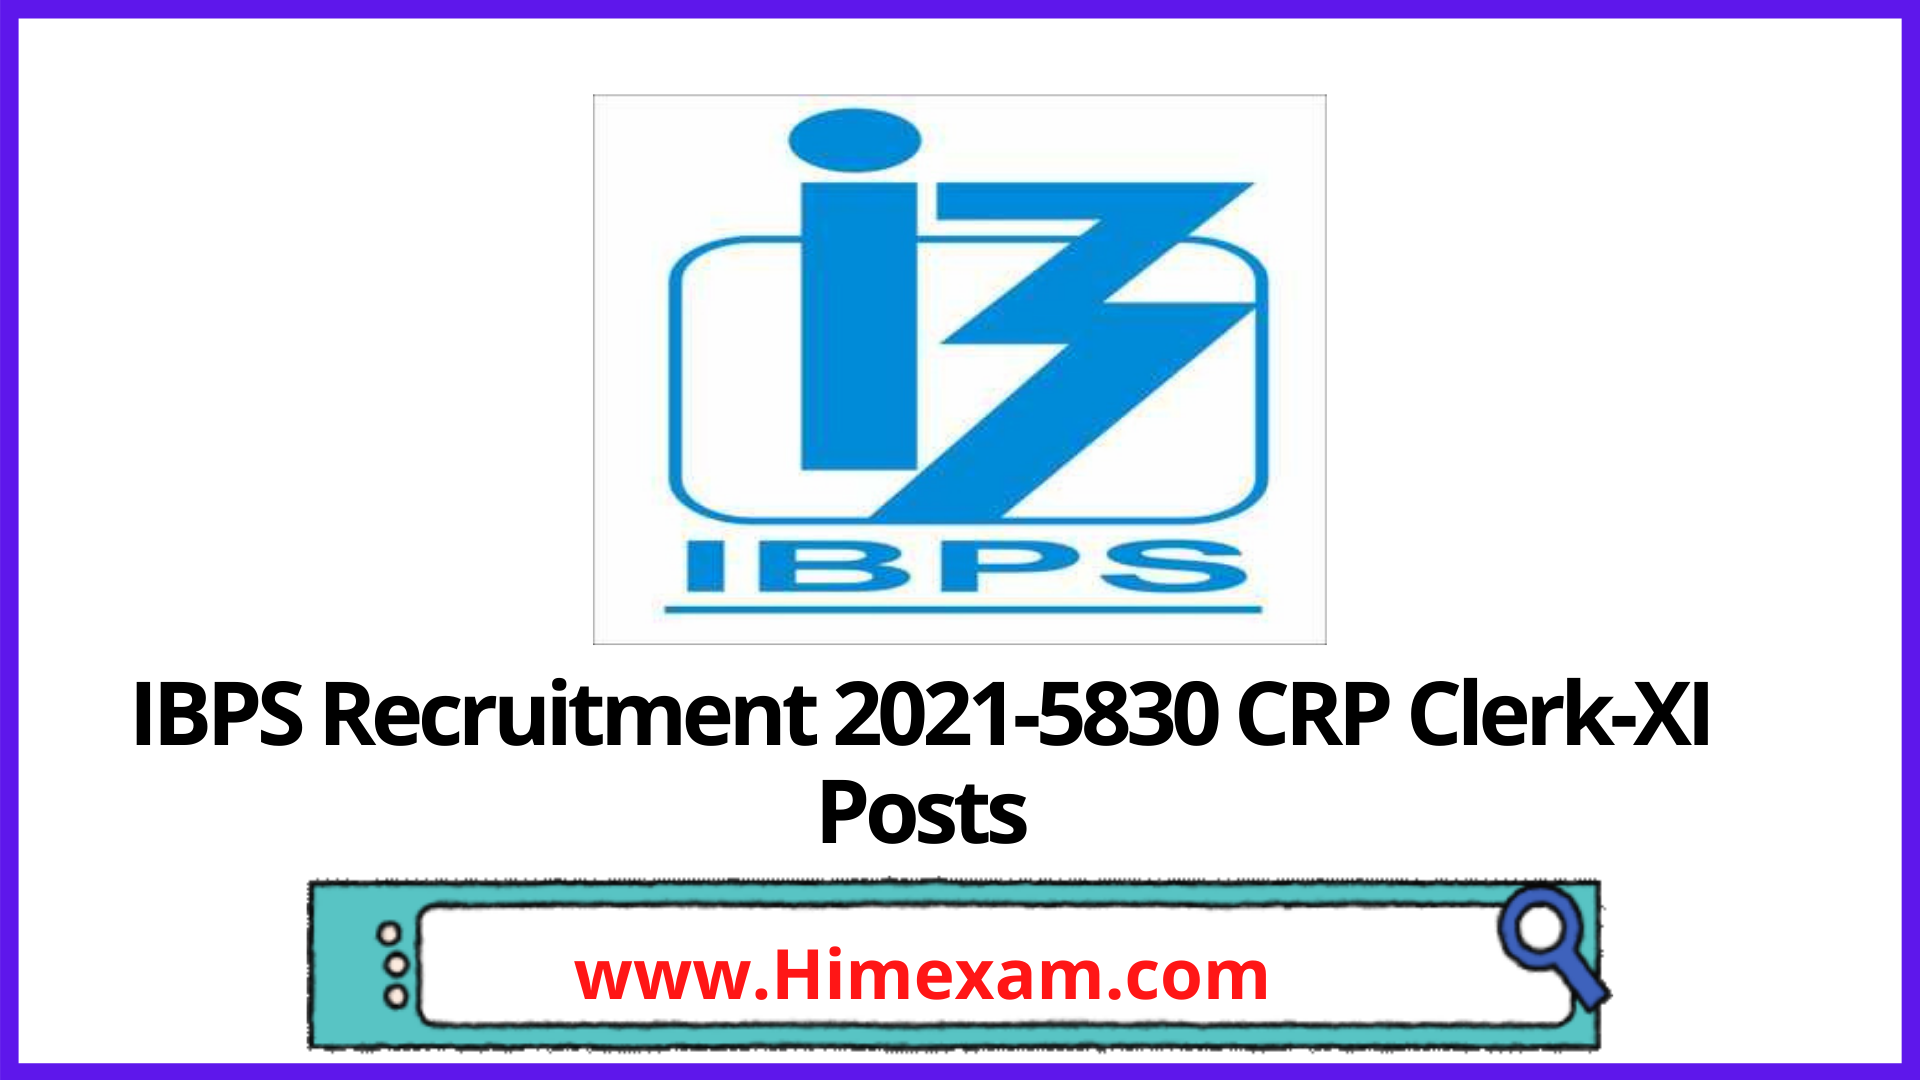 IBPS Recruitment 2021-5830 CRP Clerk-XI Posts